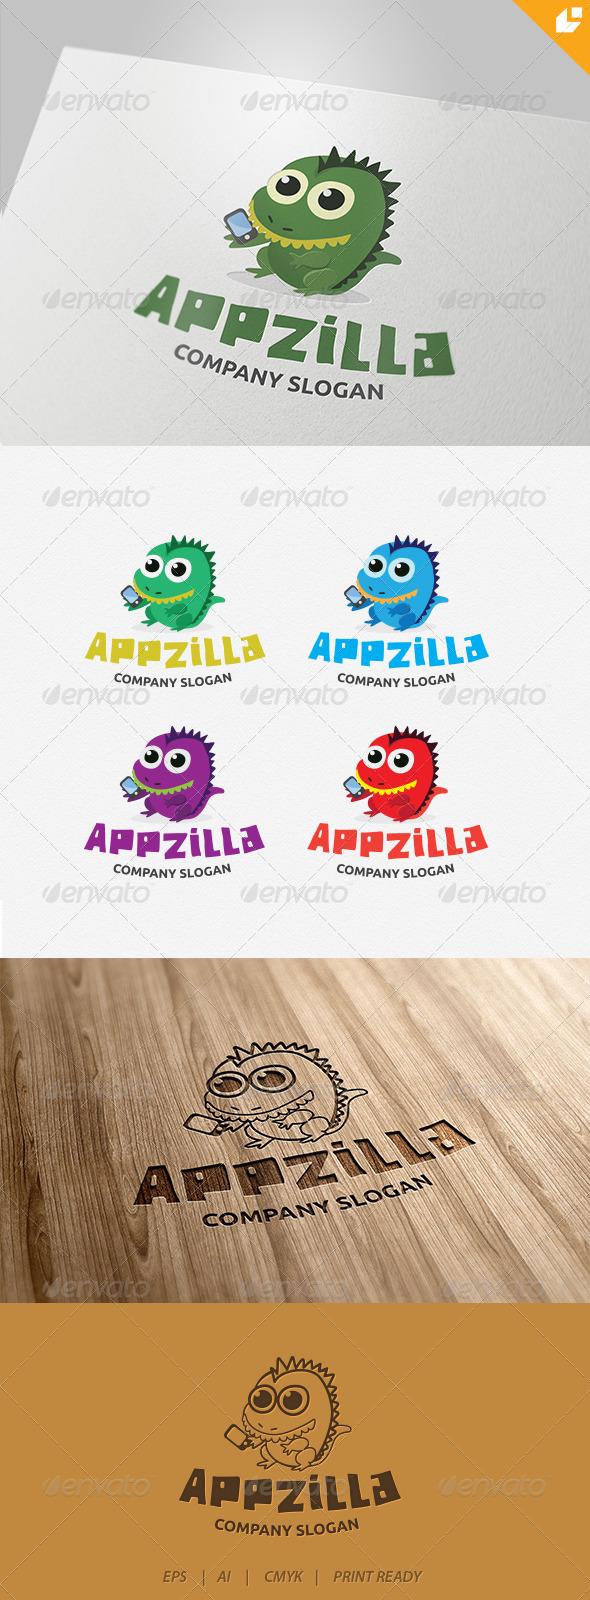 Application logo v1  - Animals Logo Templates